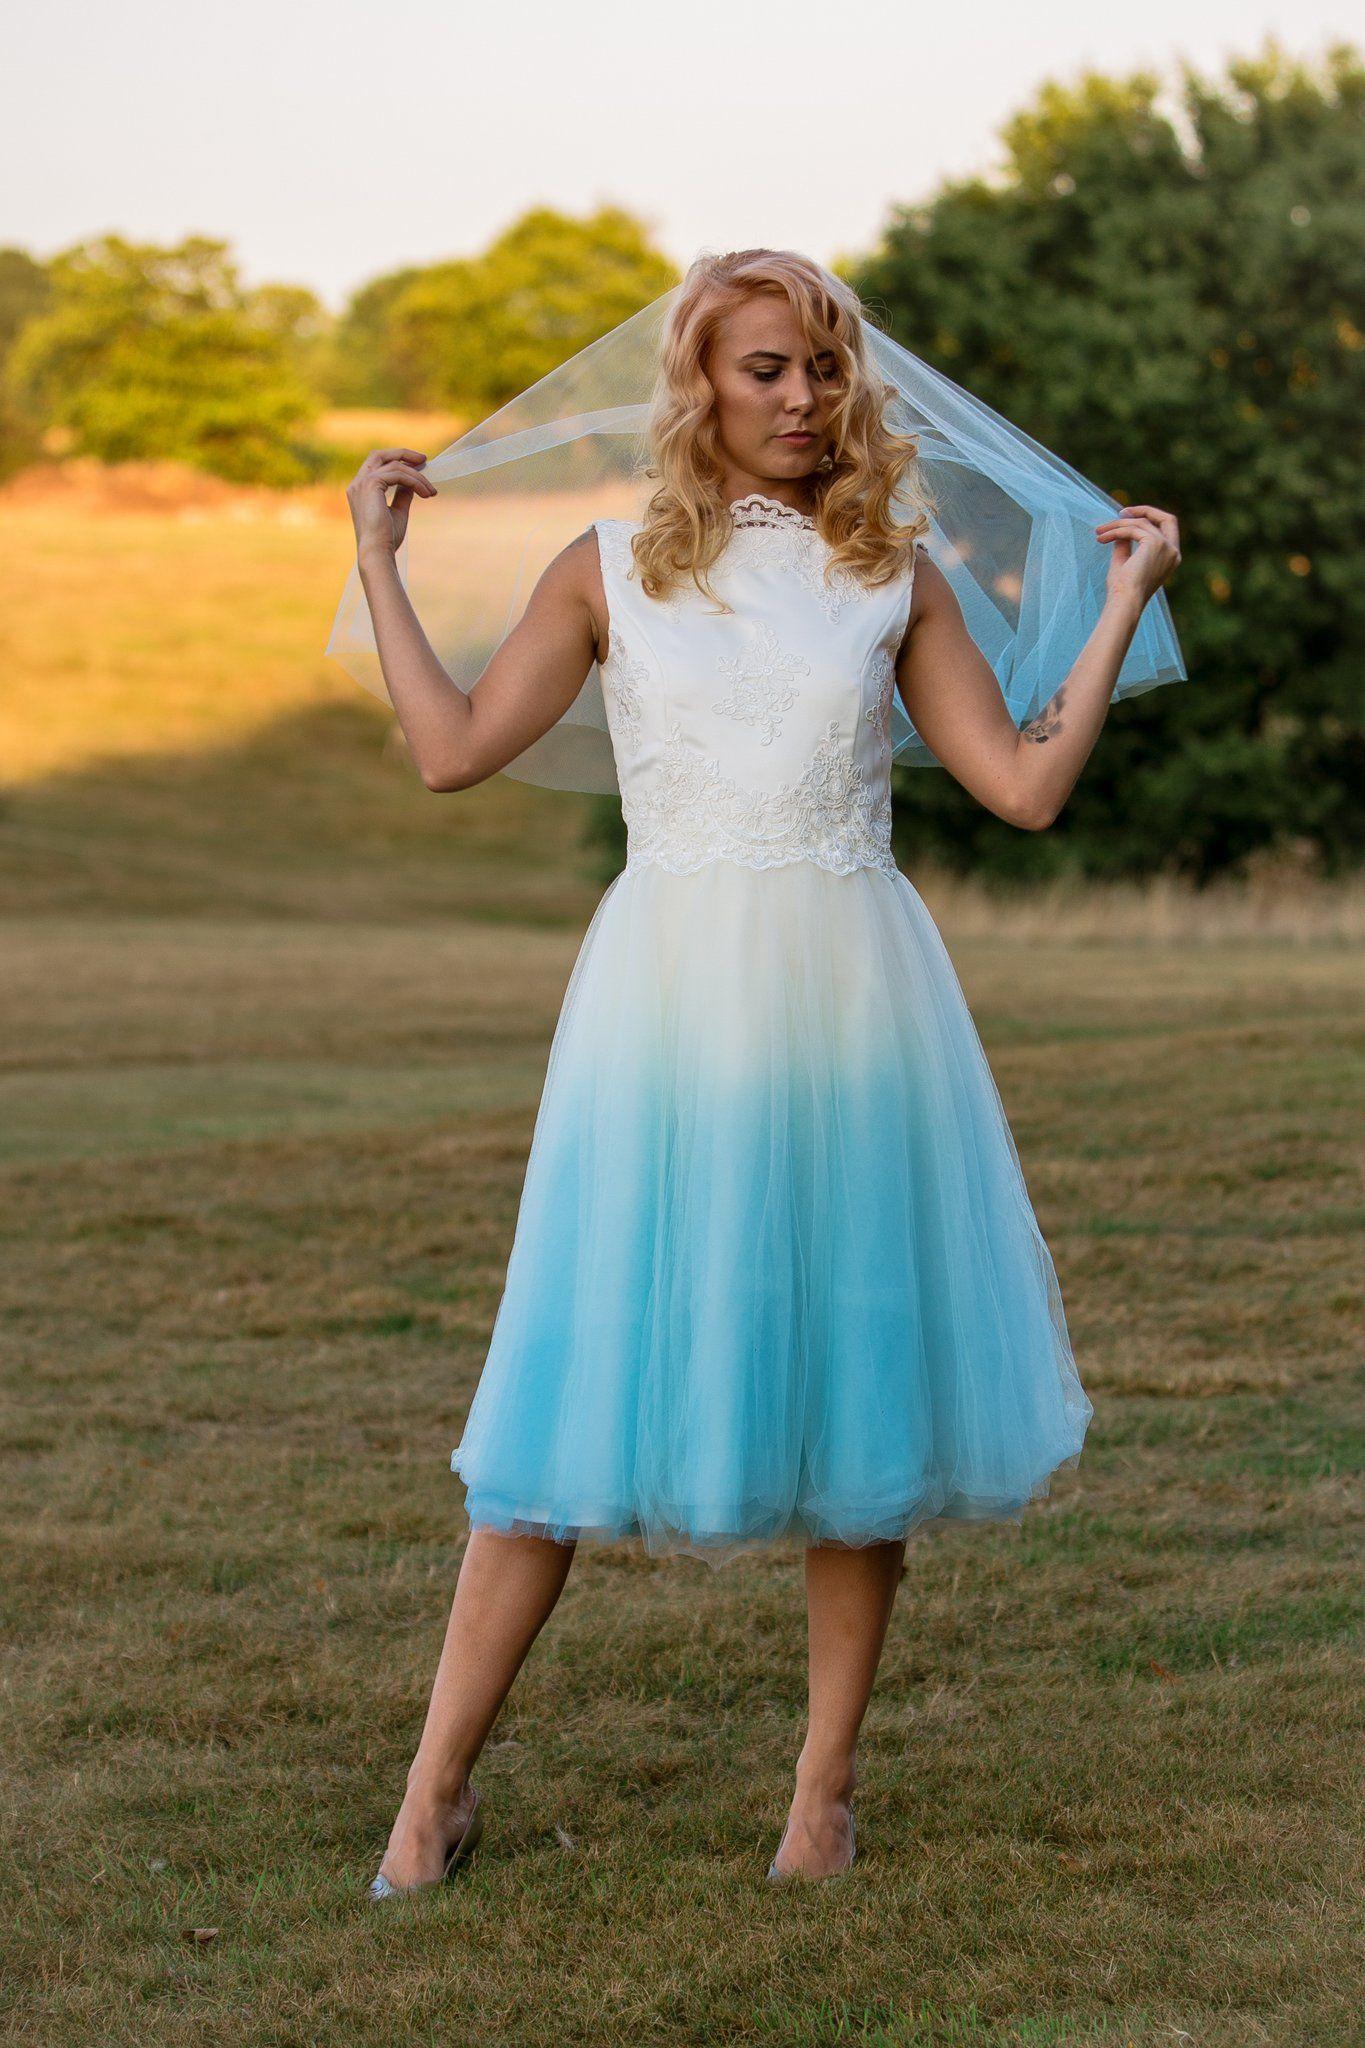 Dip dye Boho style wedding dress. Unique blue Dip dyed wedding dress ...